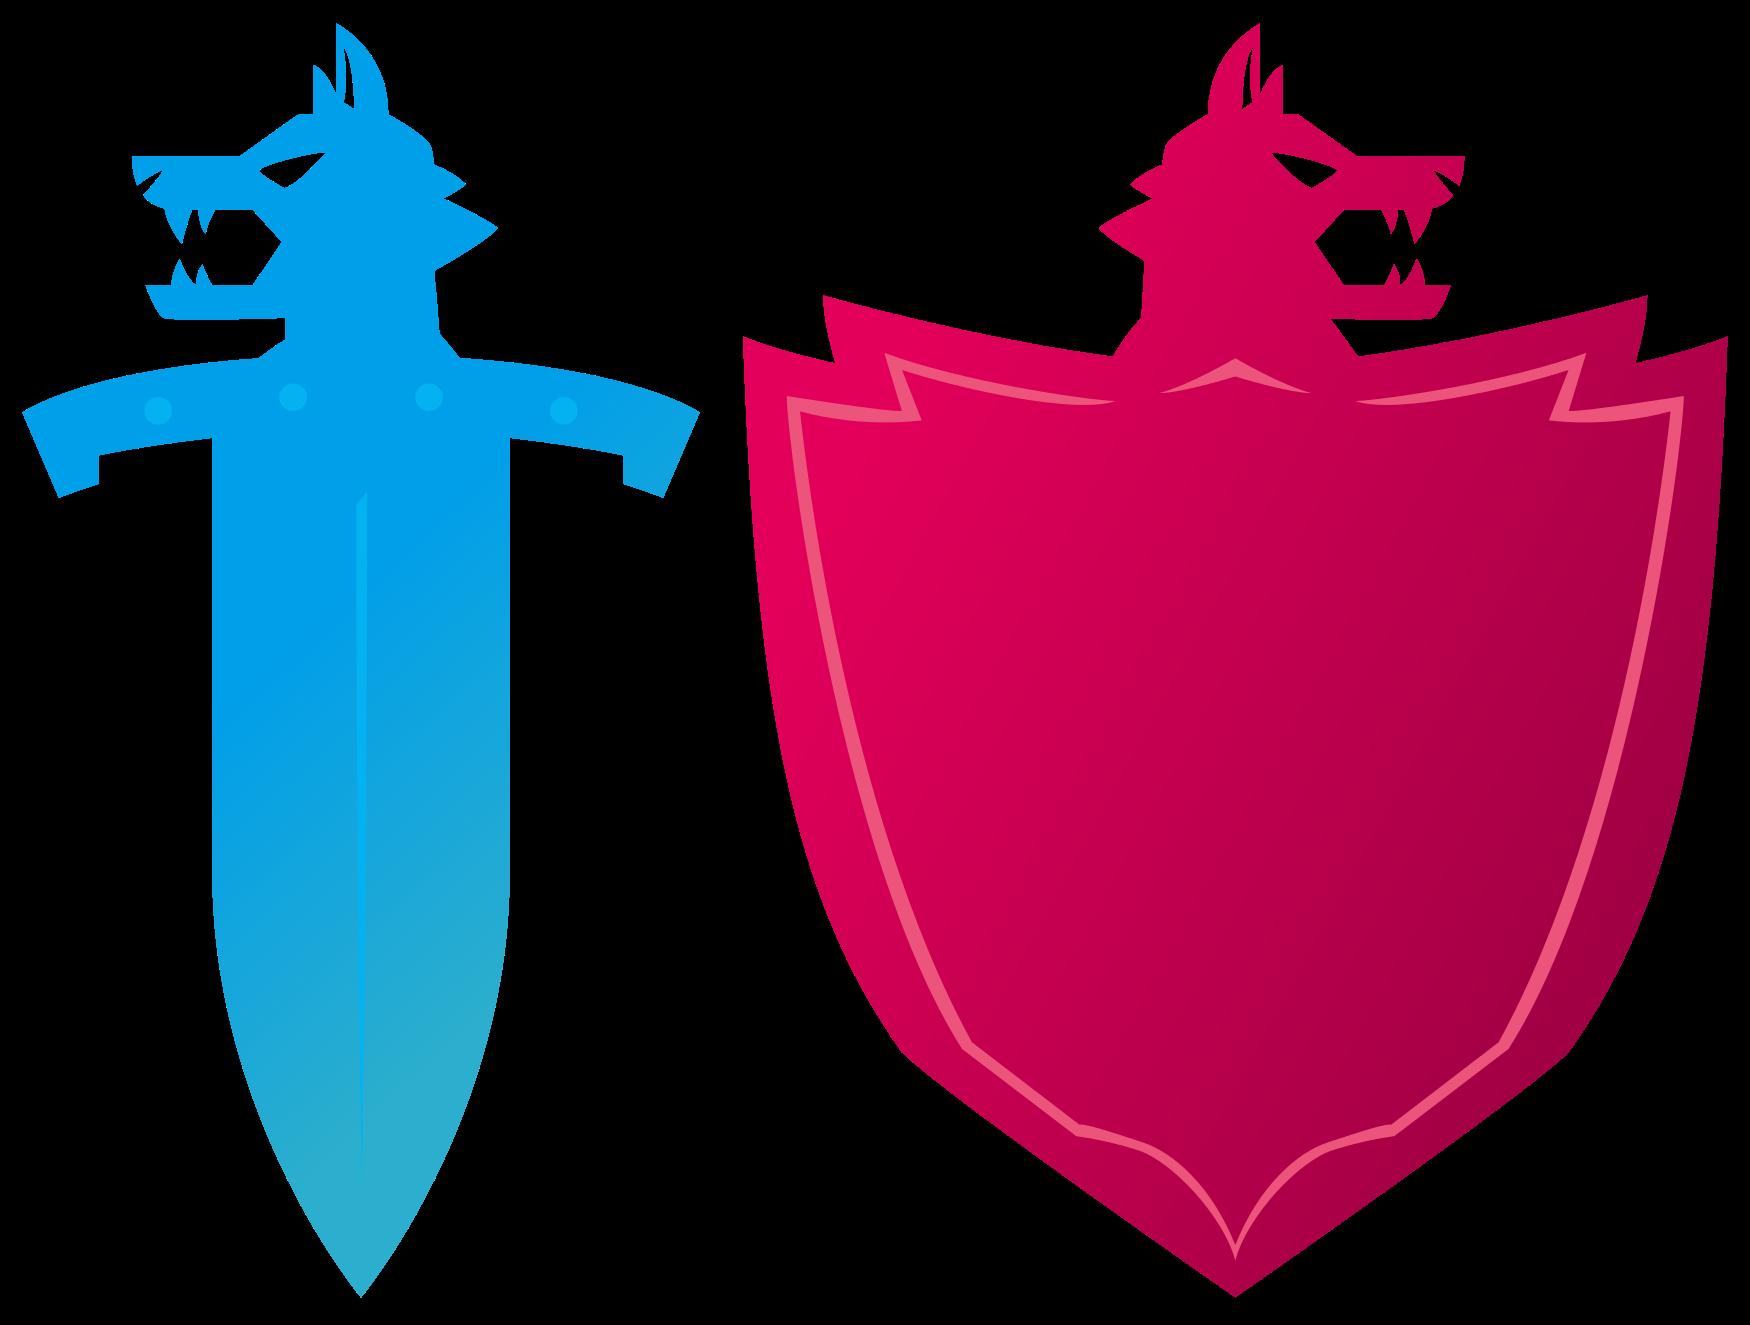 Pokemon Sword And Shield Symbols Recreation By Decatilde On Deviantart Pokemon Sword Shield